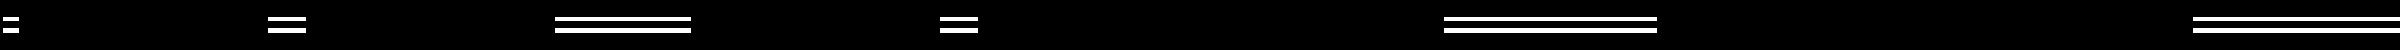 horizontal-line.png